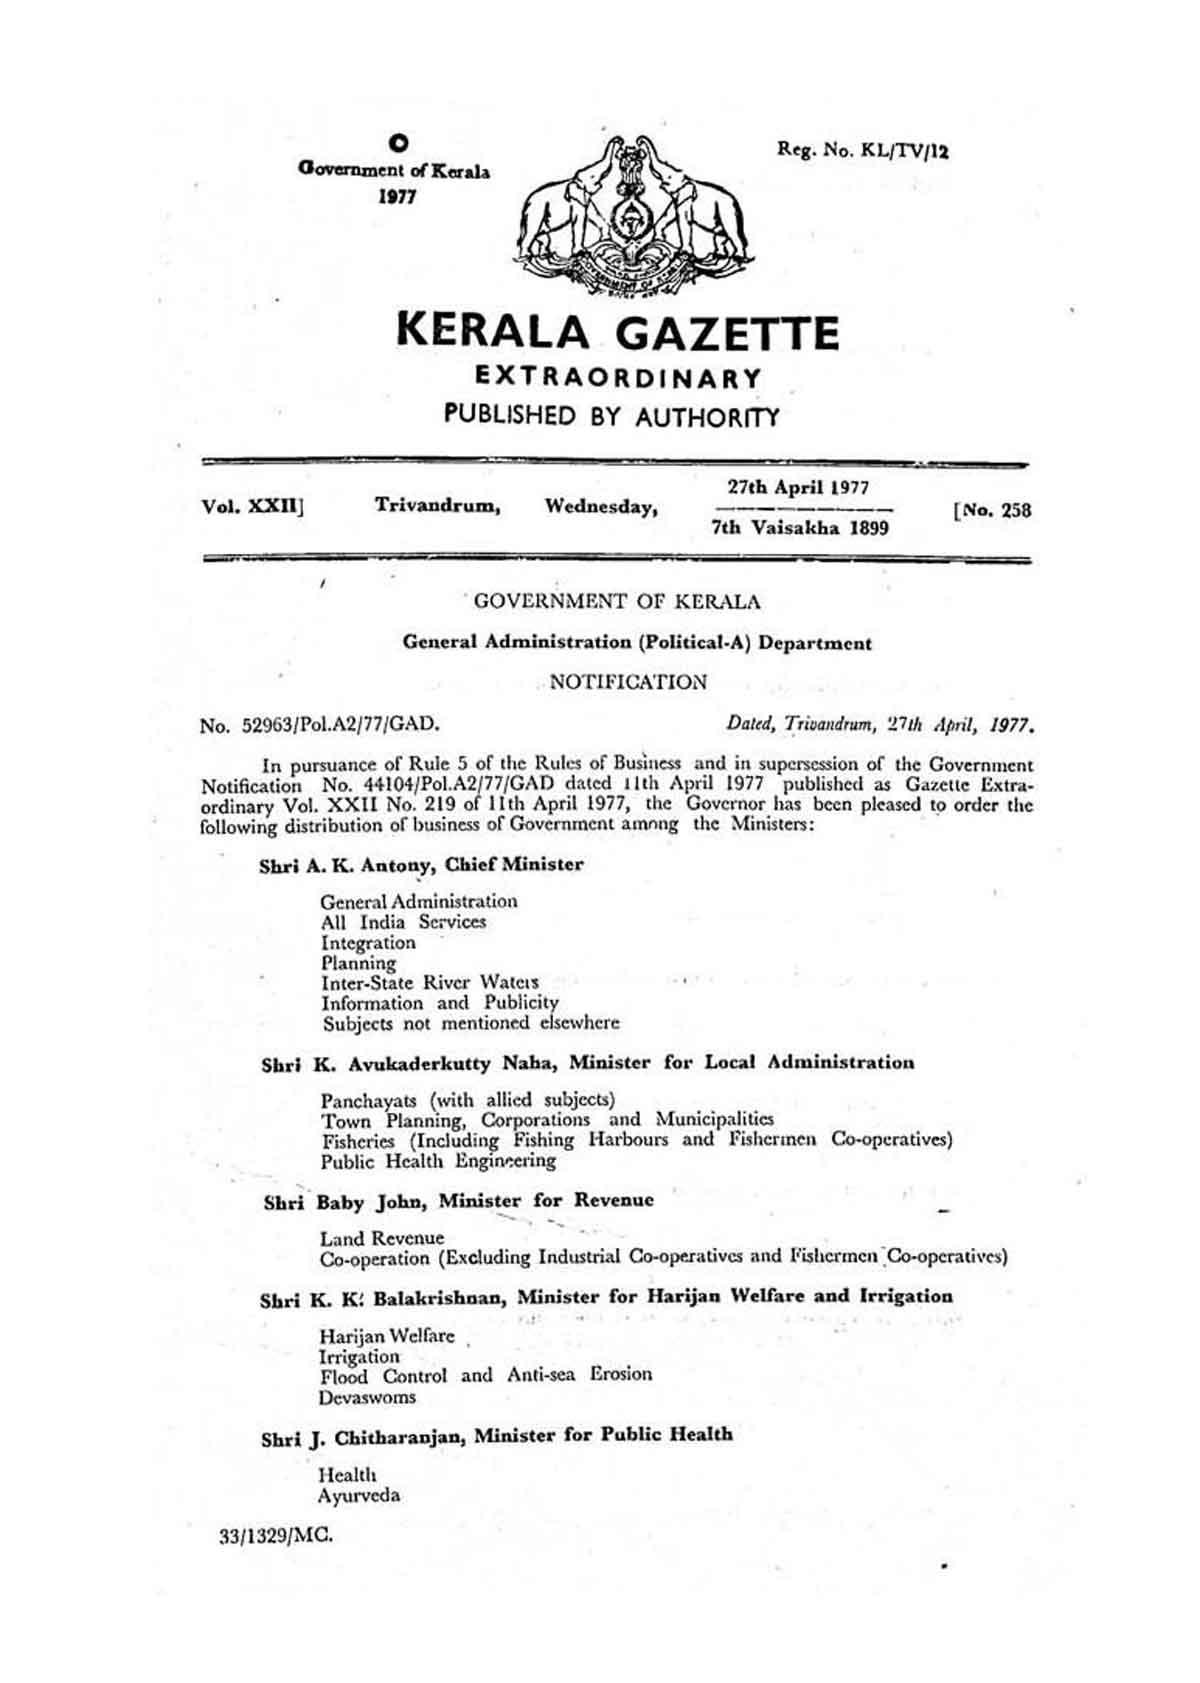 KK Balakrishnan Gazatte